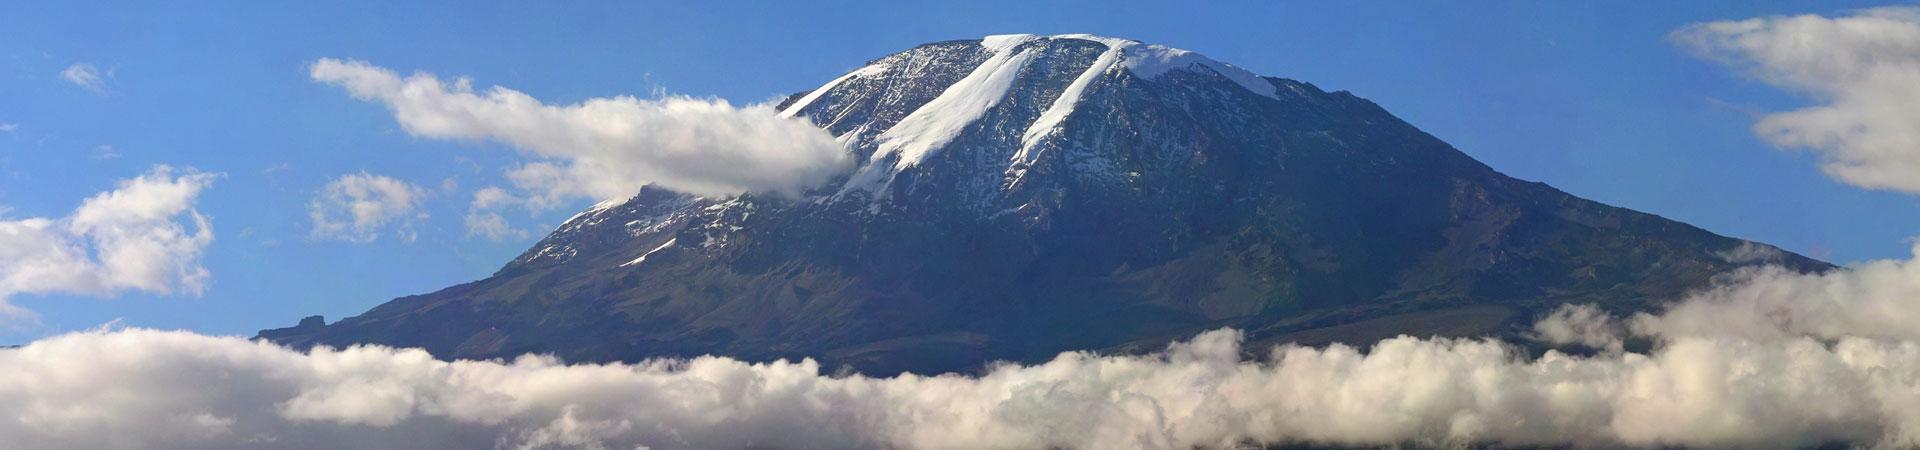 Mt-Kilimanjaro-Trekking-East-Africa-